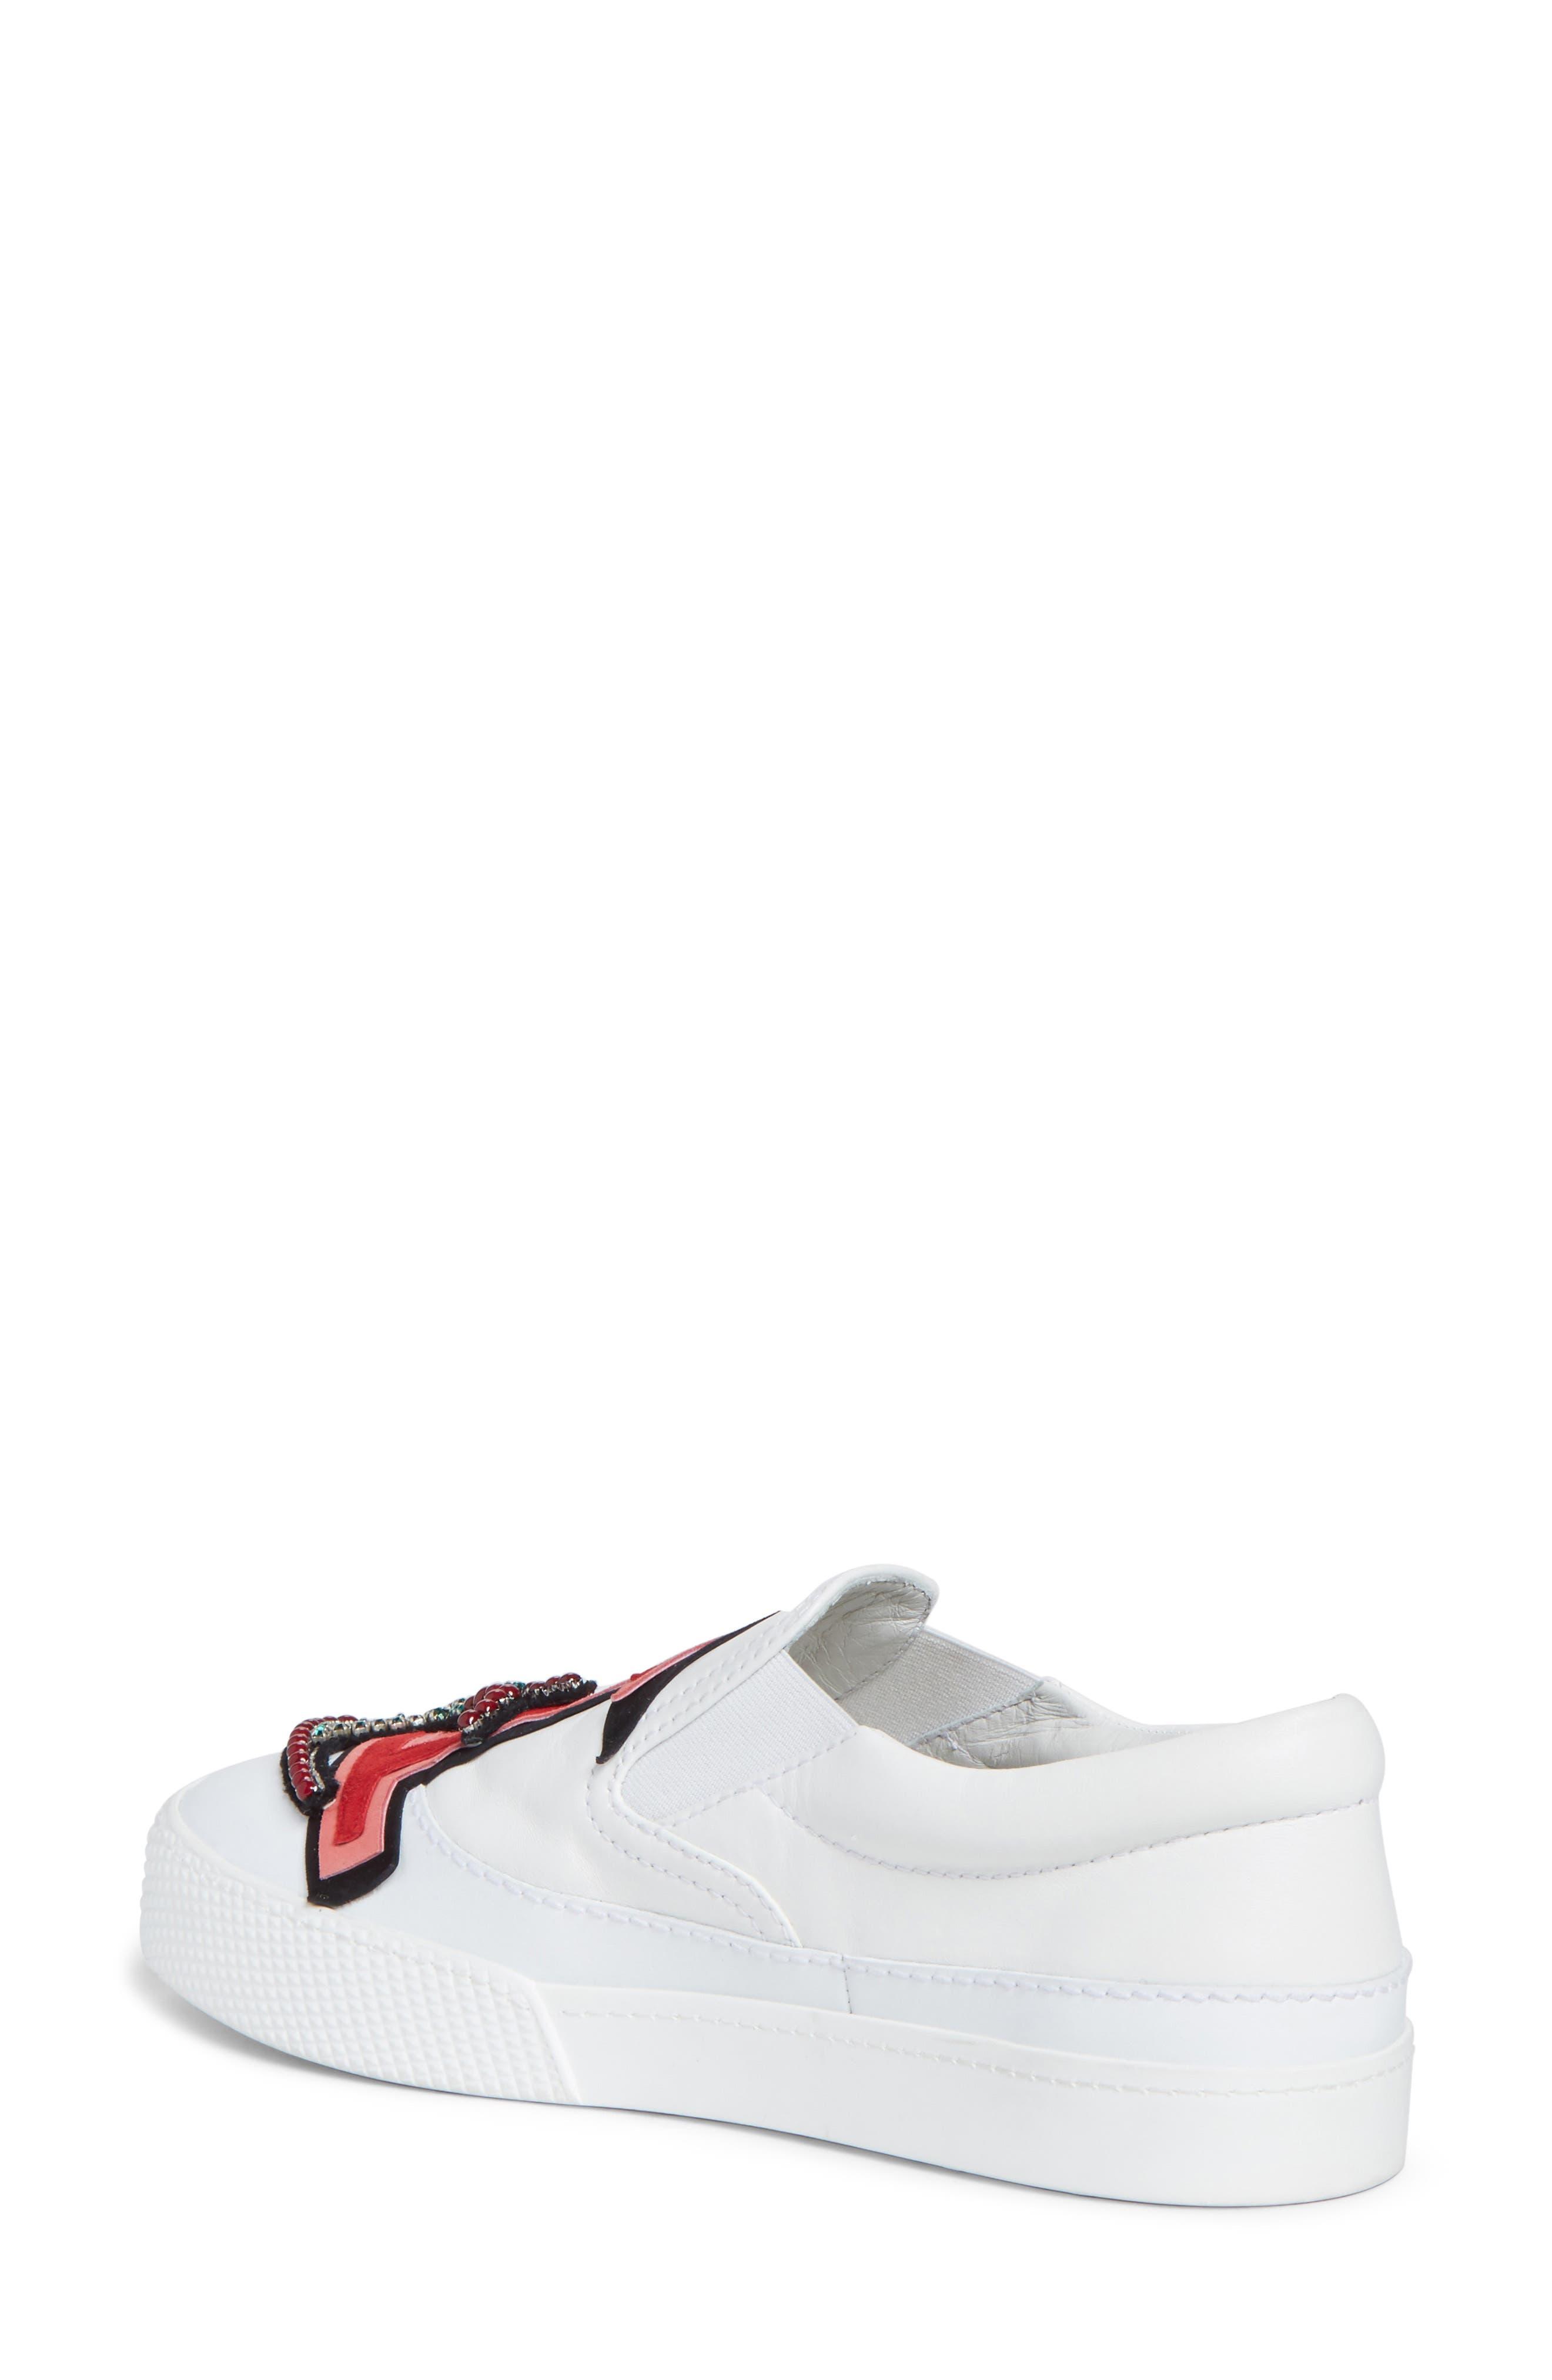 Embellished Slip-On Sneaker,                             Alternate thumbnail 2, color,